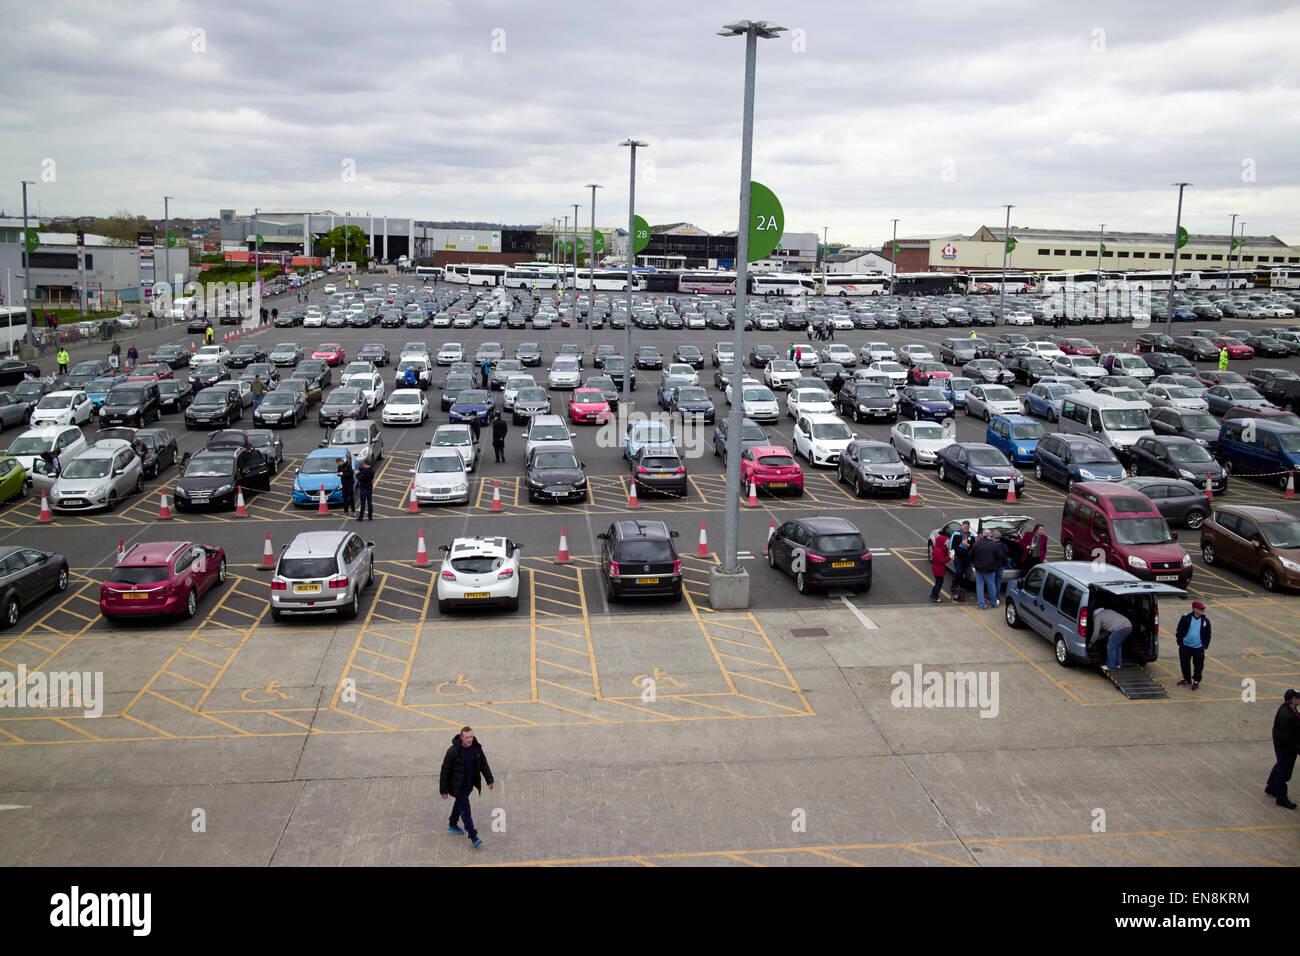 car park with disabled parking spots at Wembley stadium London UK - Stock Image